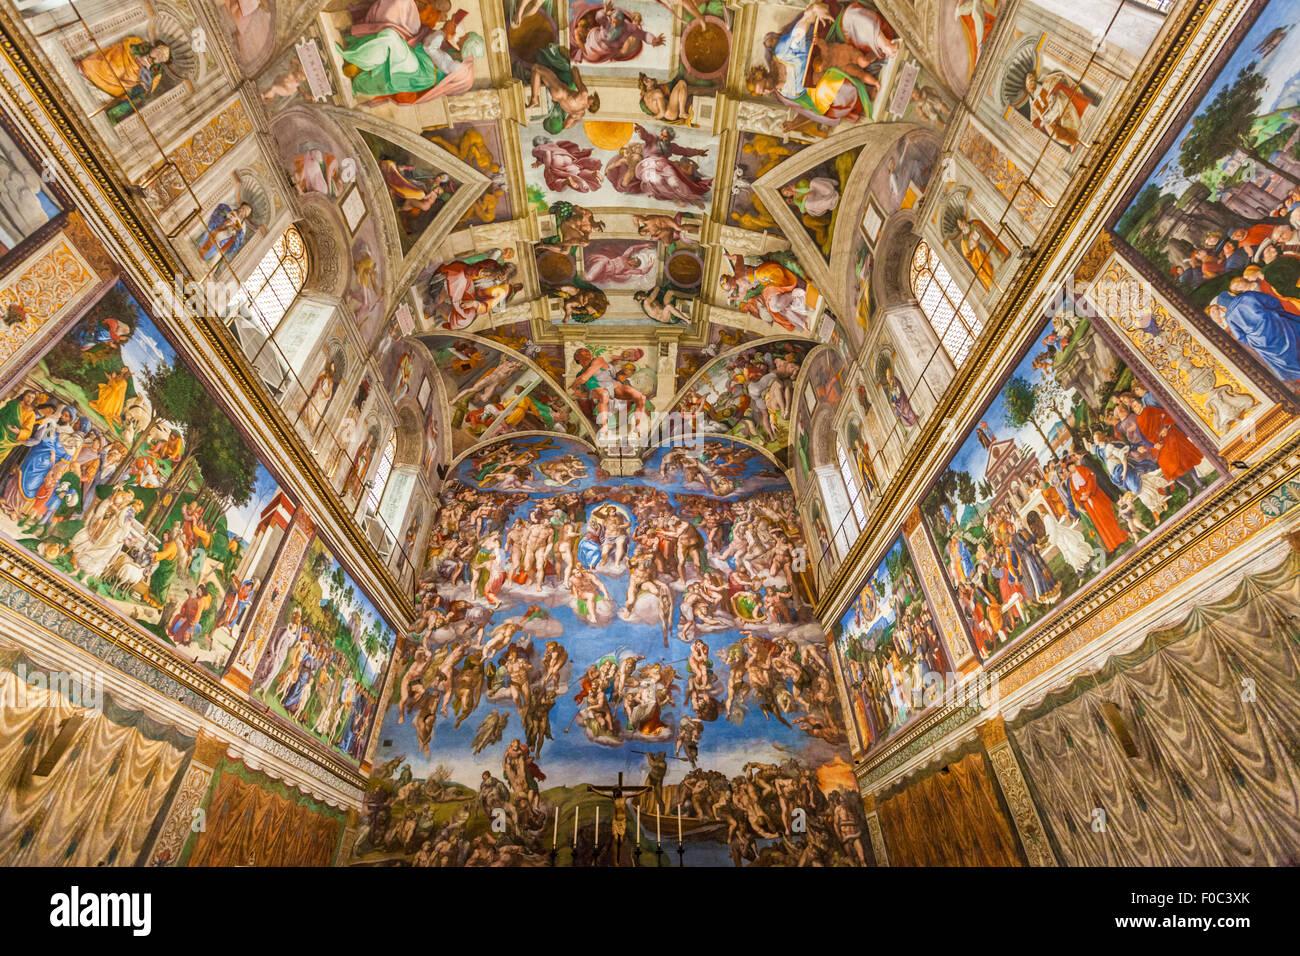 Sistine Chapel Apostolic Palace Vatican Museum Vatican City Rome Italy EU Europe Stock Photo